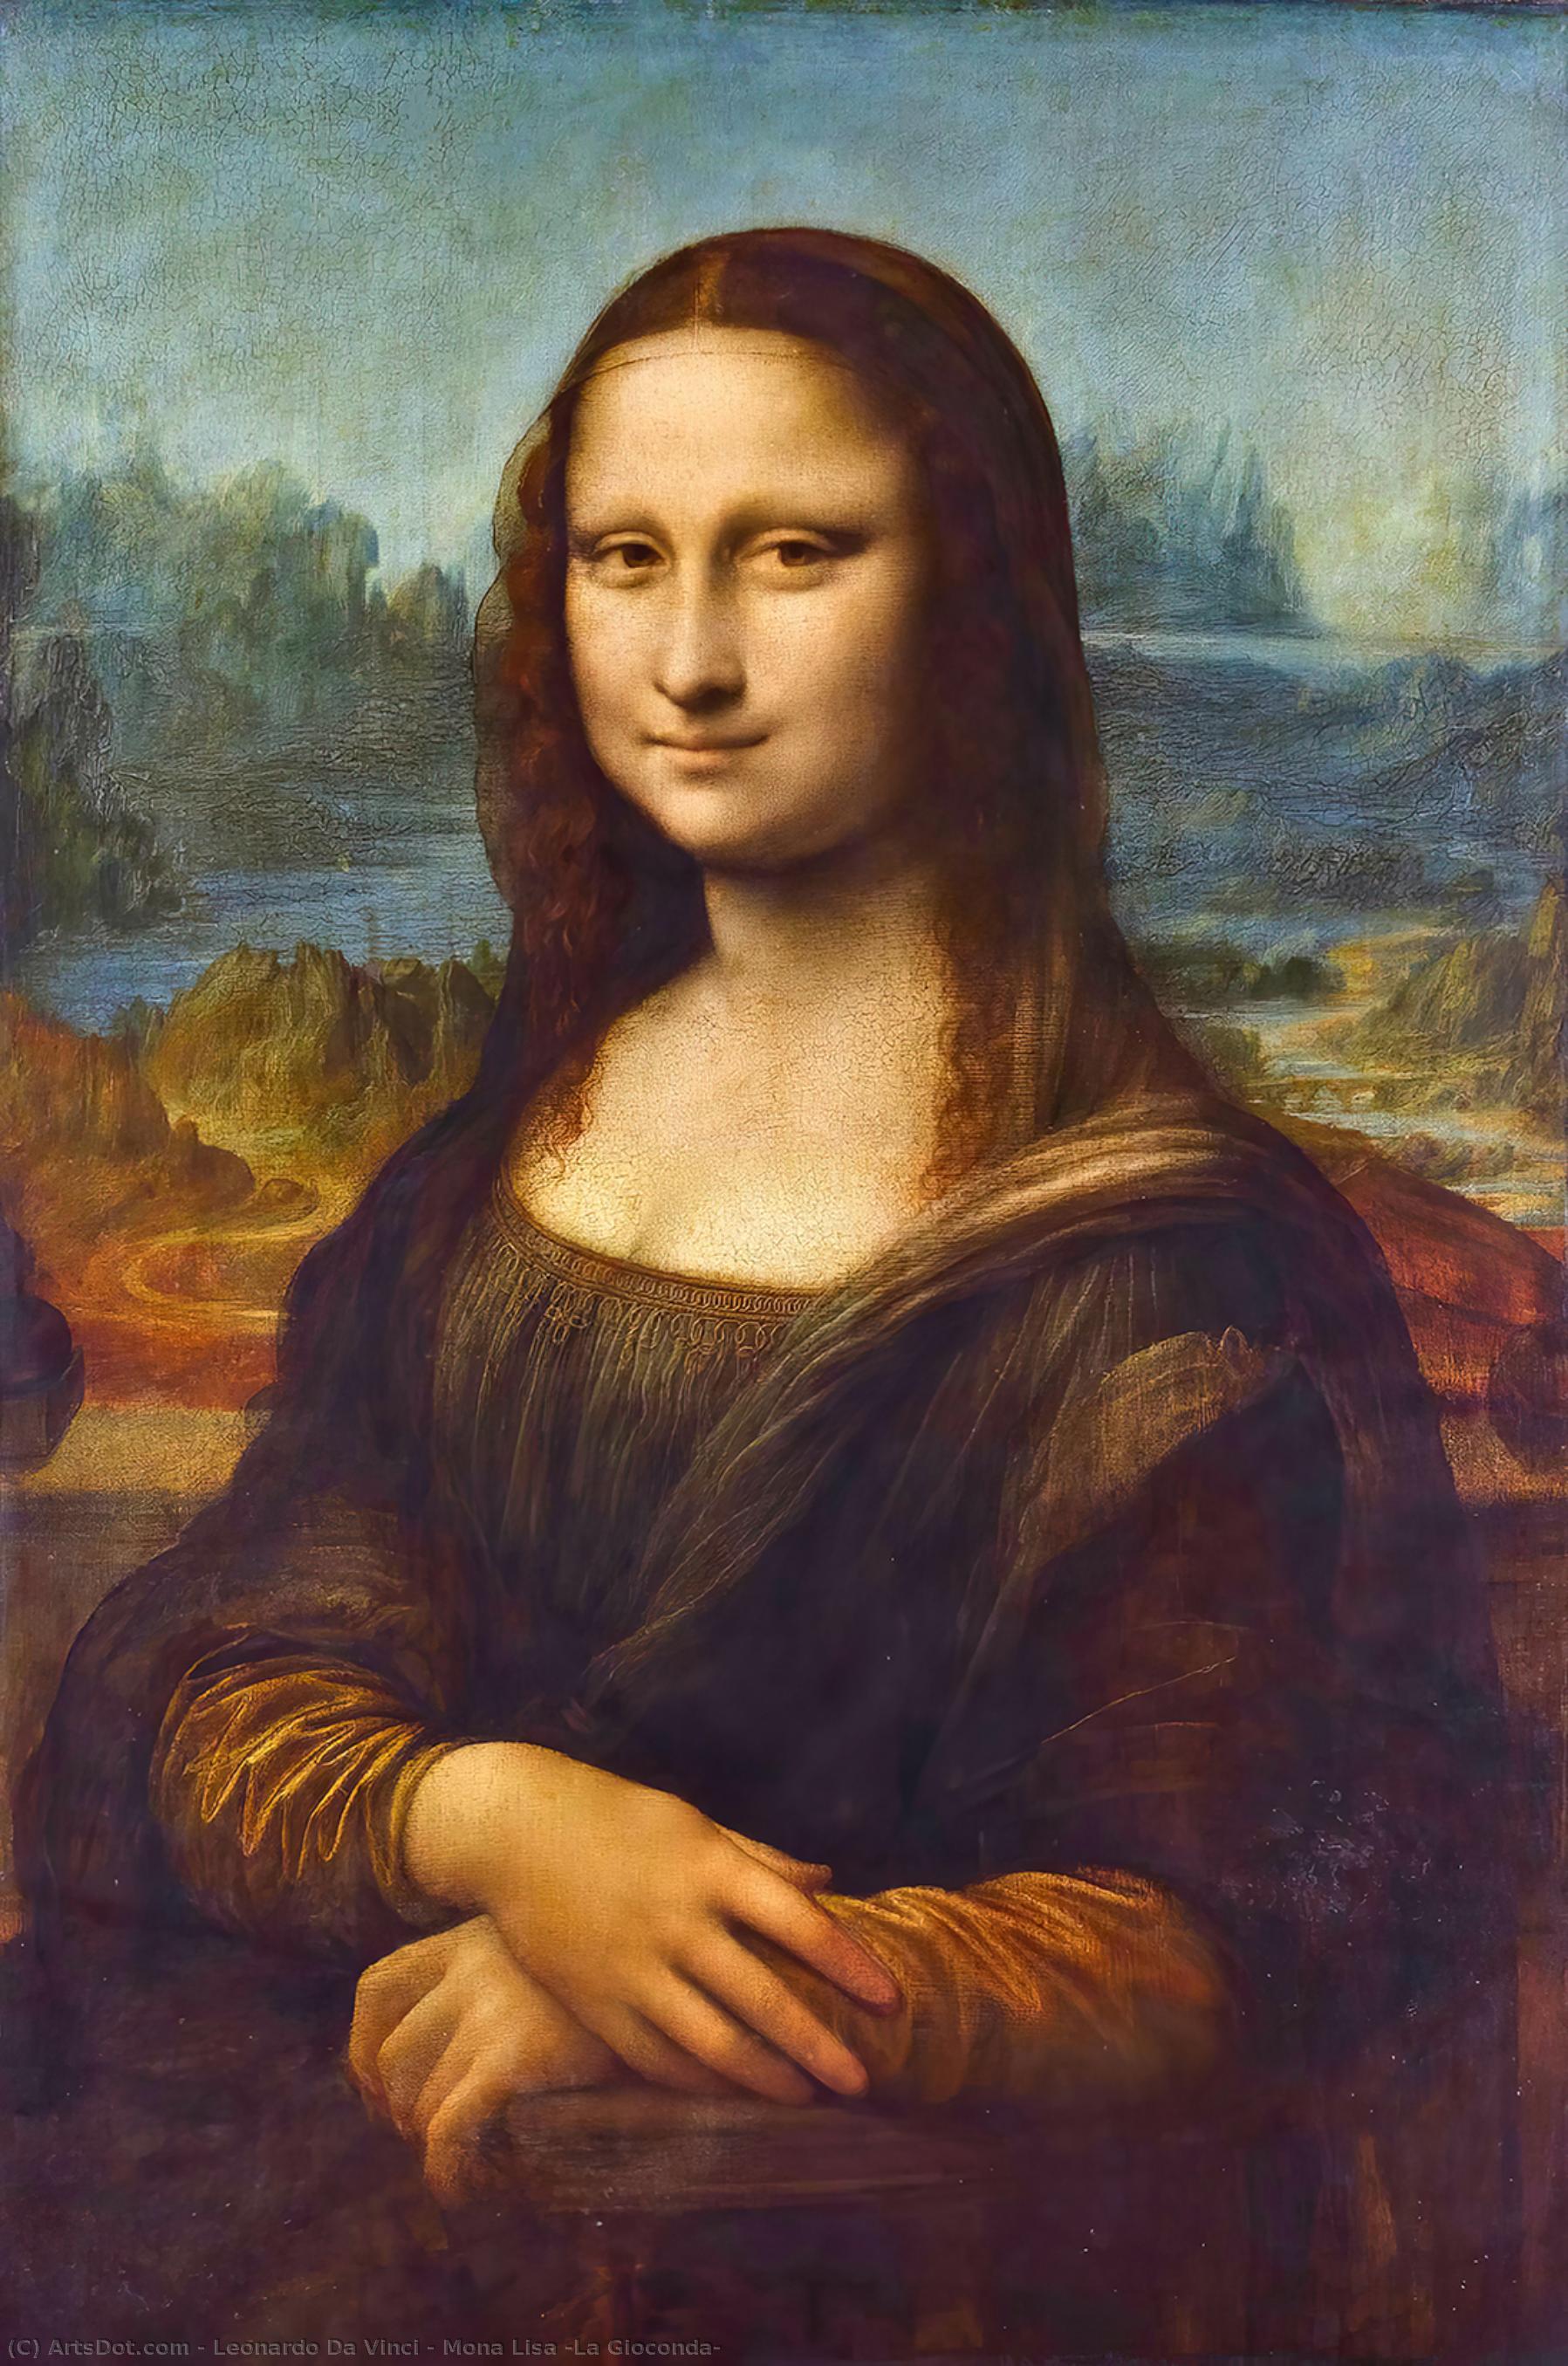 WikiOO.org - Enciclopedia of Fine Arts - Pictura, lucrări de artă Leonardo Da Vinci - Mona Lisa (La Gioconda)